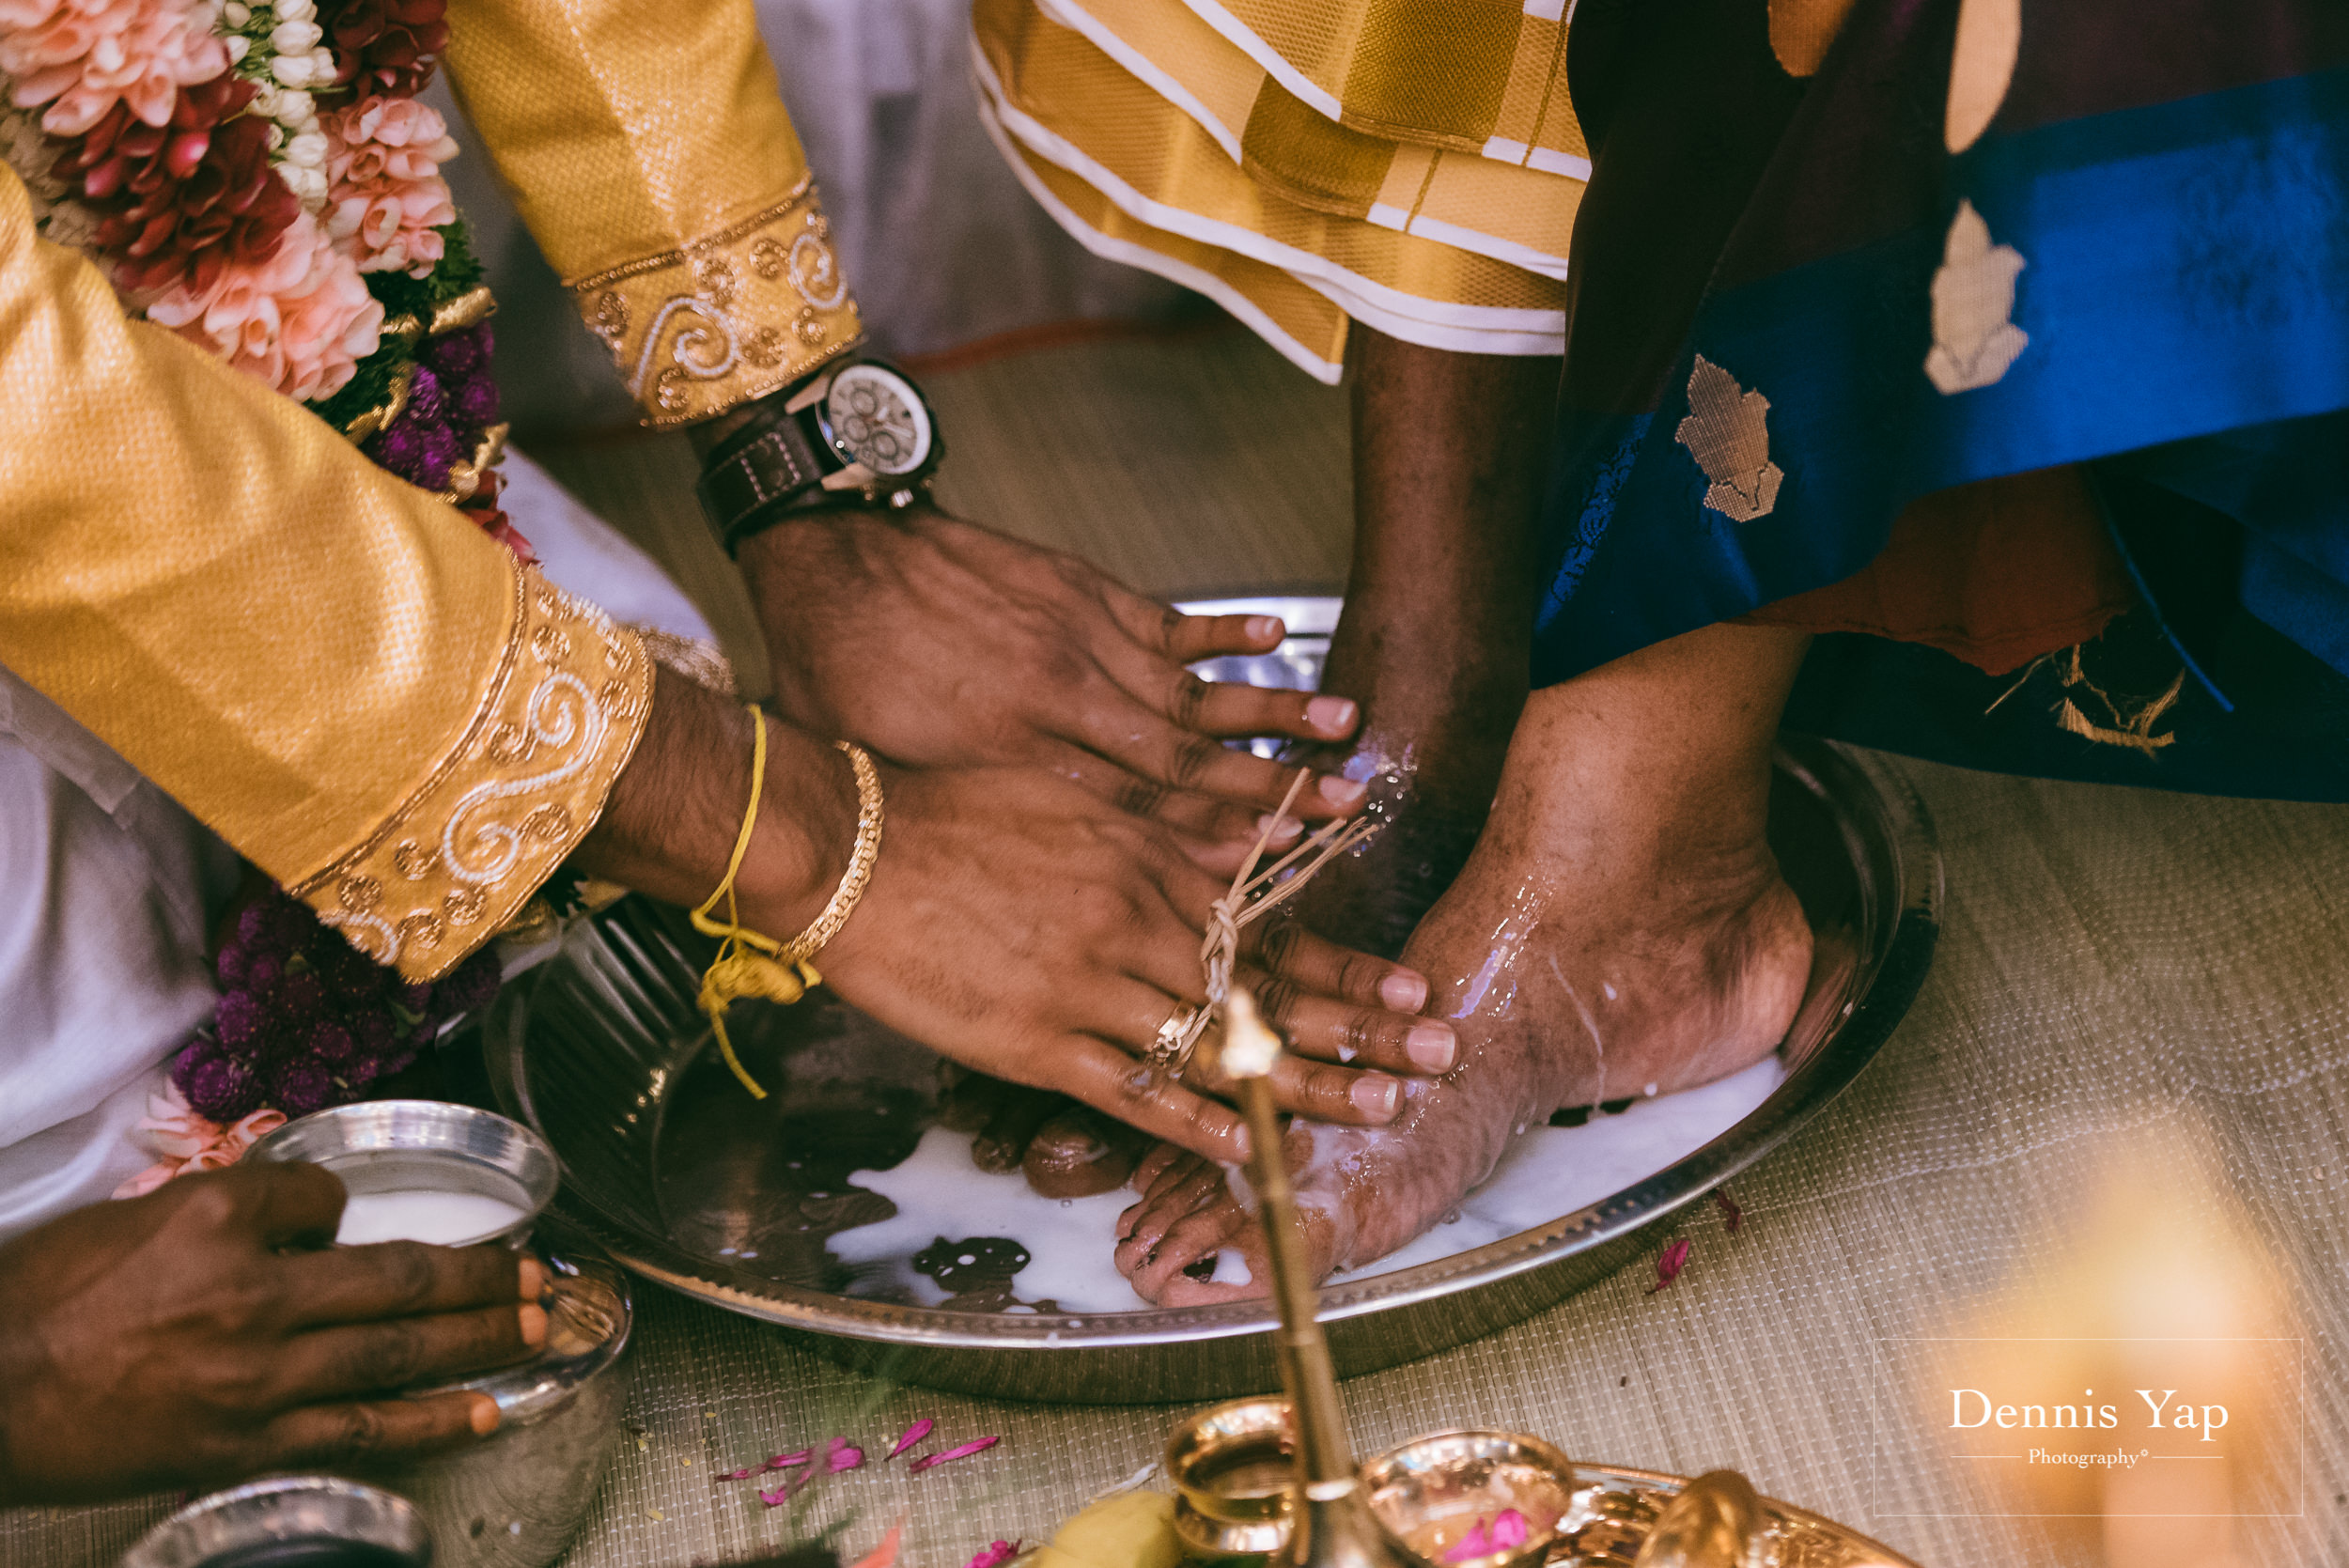 puvaneswaran cangitaa indian wedding ceremony ideal convention dennis yap photography malaysia-21.jpg